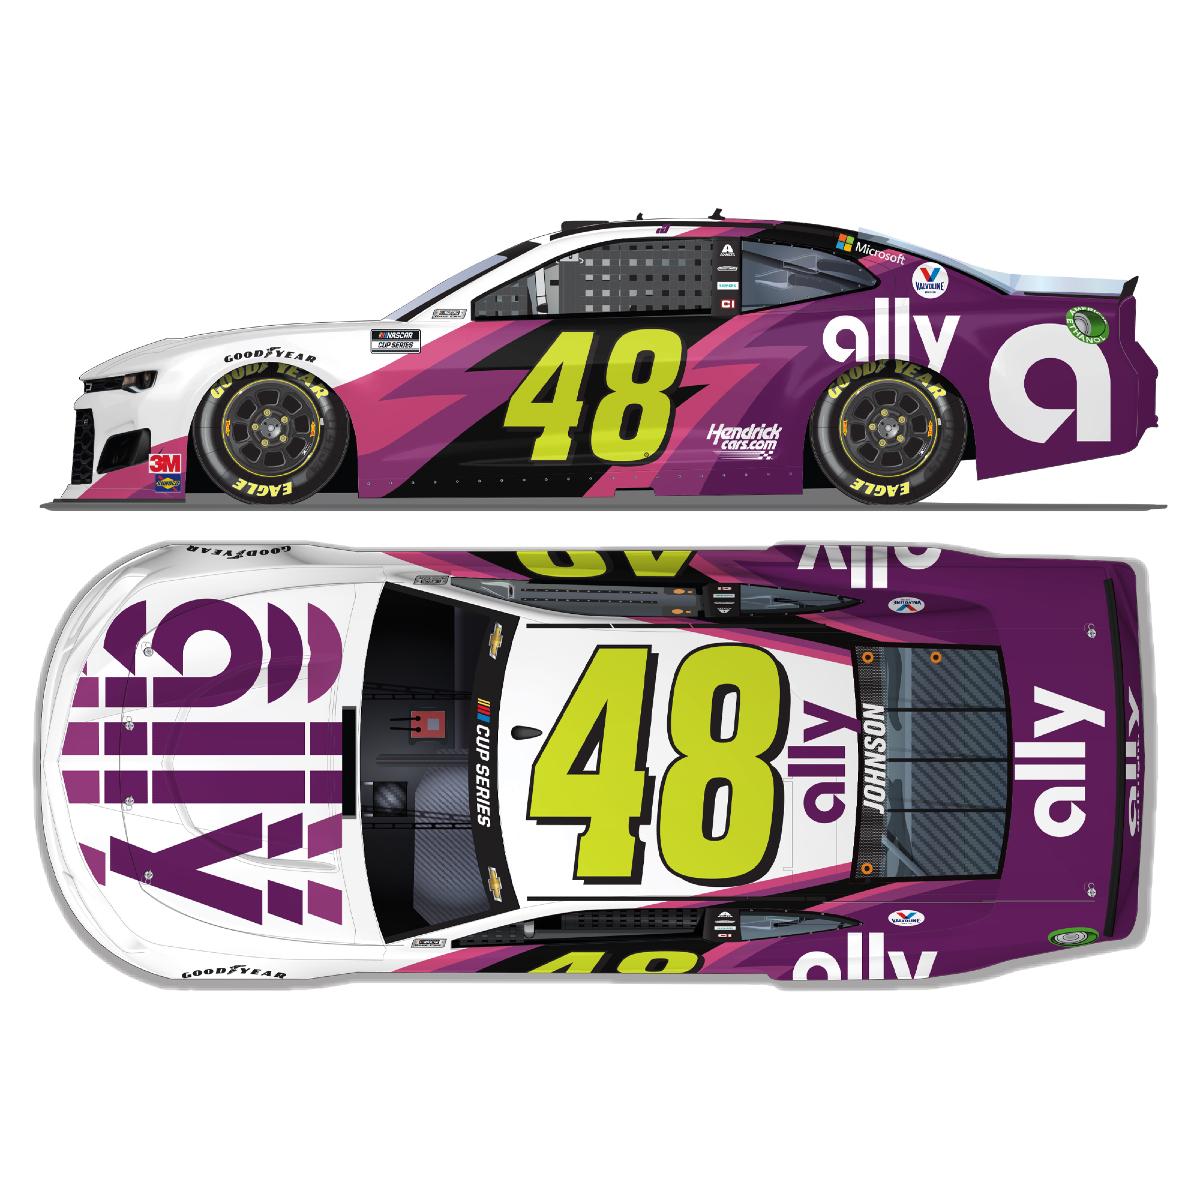 Jimmie Johnson No. 48 Ally Texas NASCAR Cup Series Elite 1:24 - Die Cast